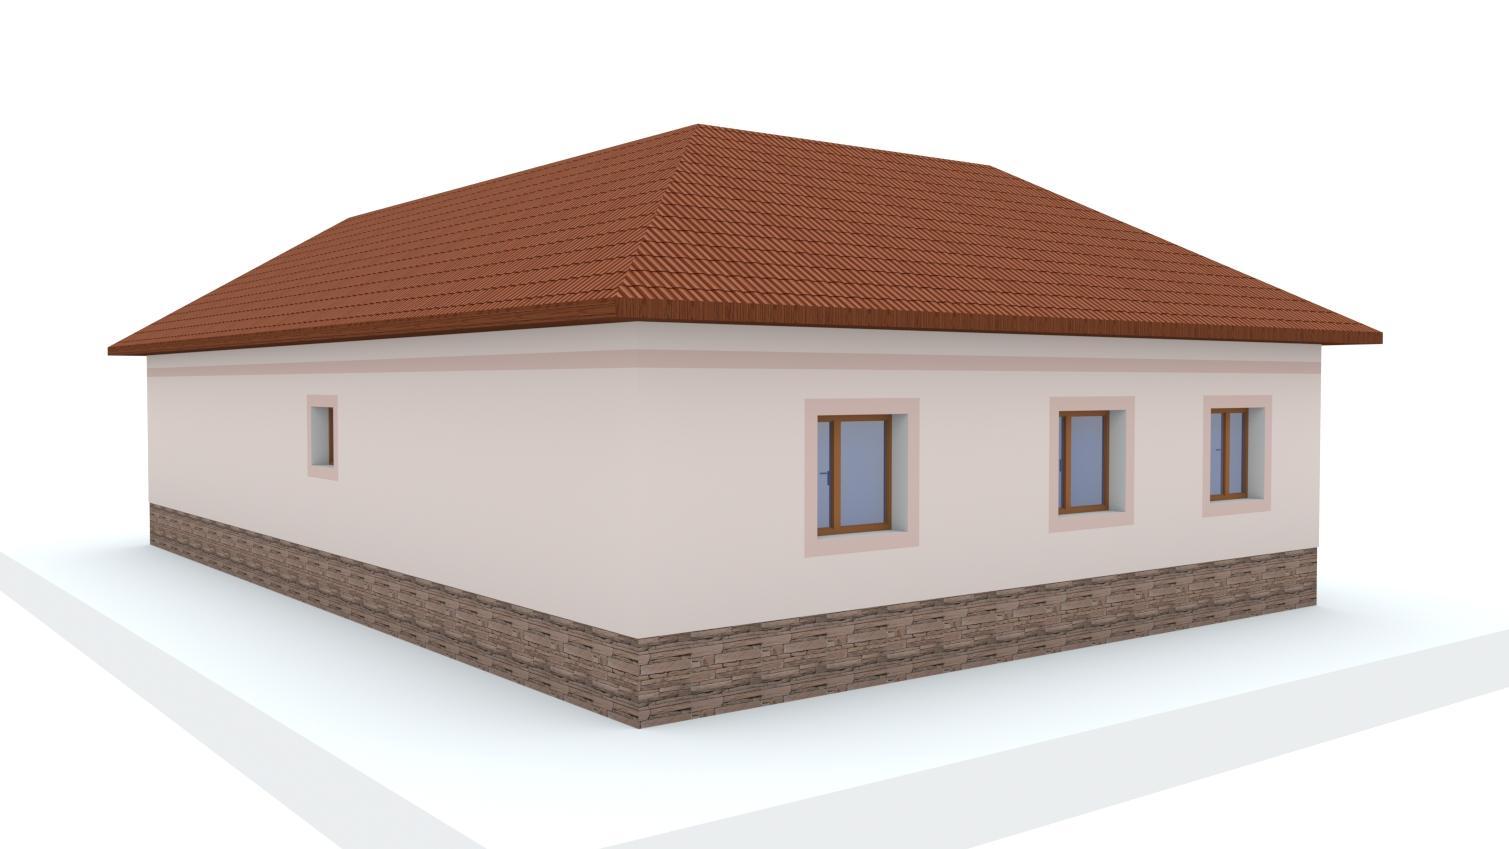 Návrh fasády rodinného domu - Obrázok č. 23